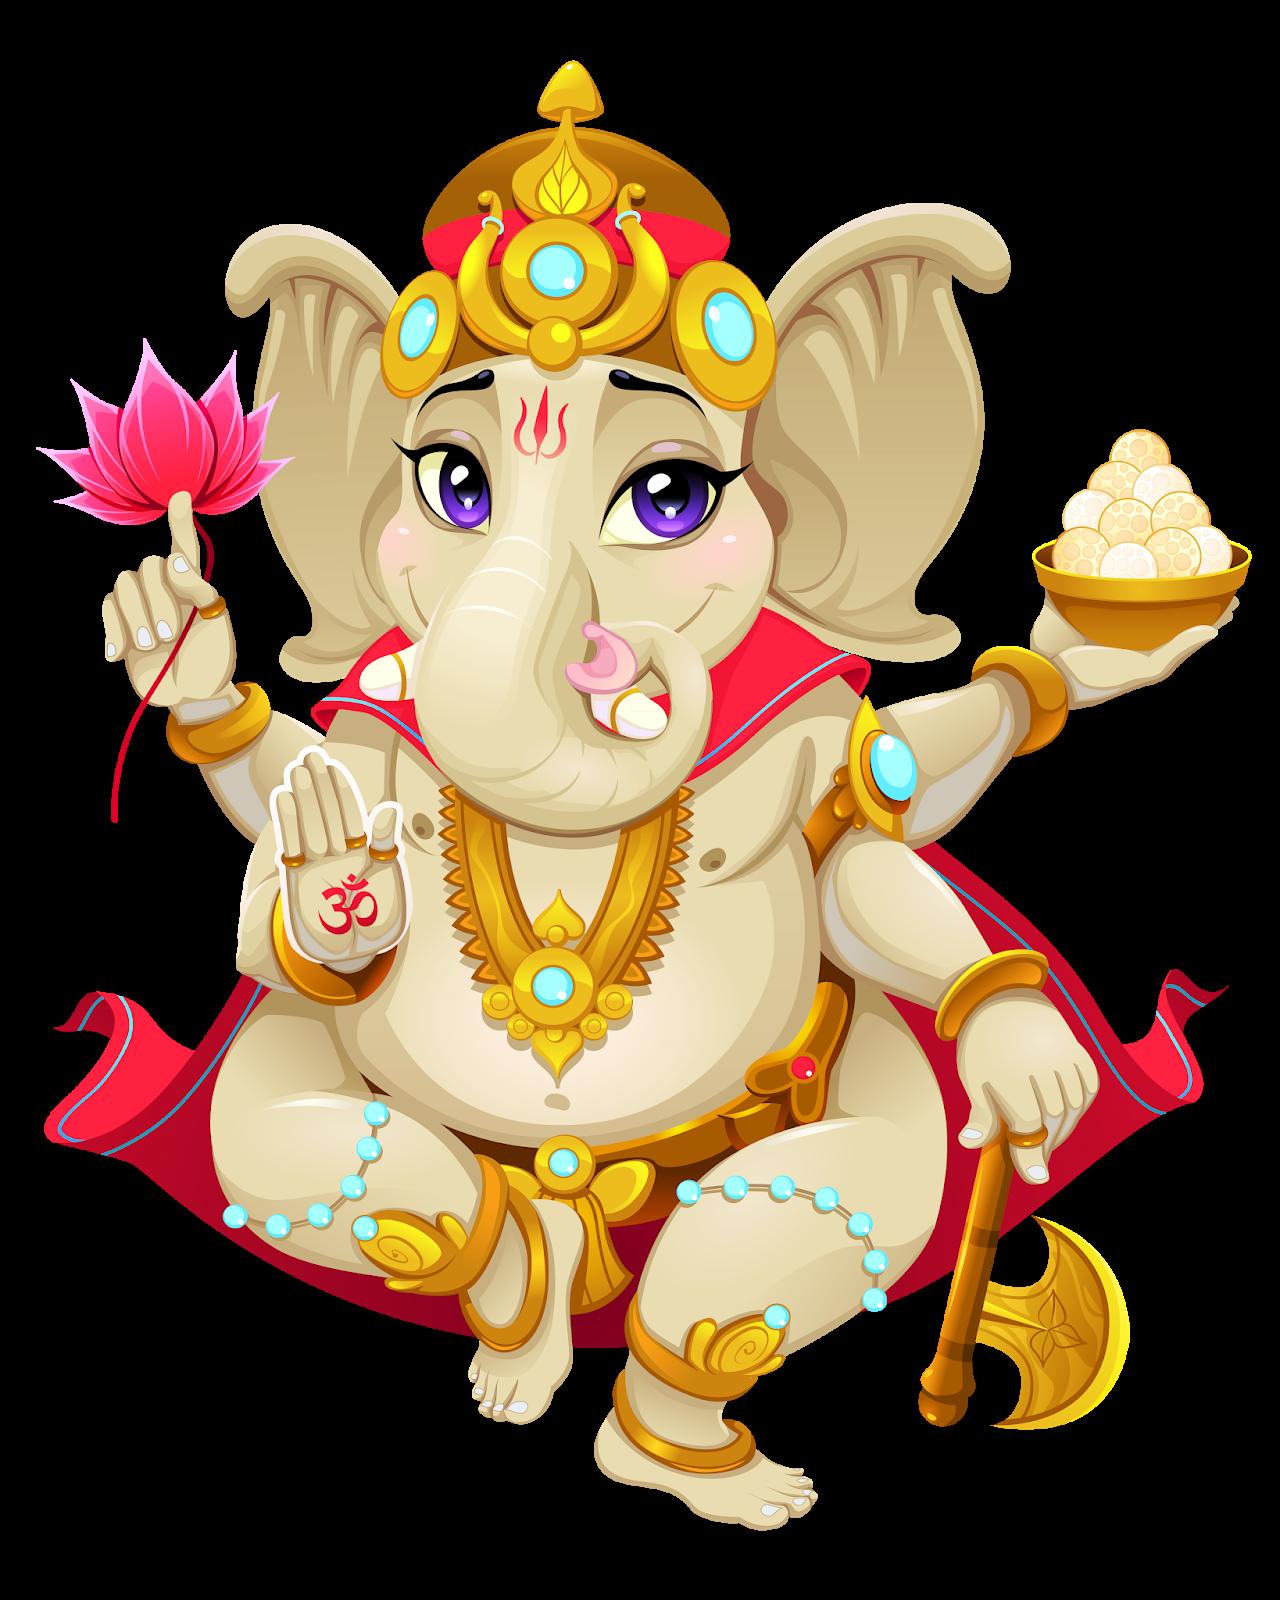 Lord Ganesha PNG Transparent Images.